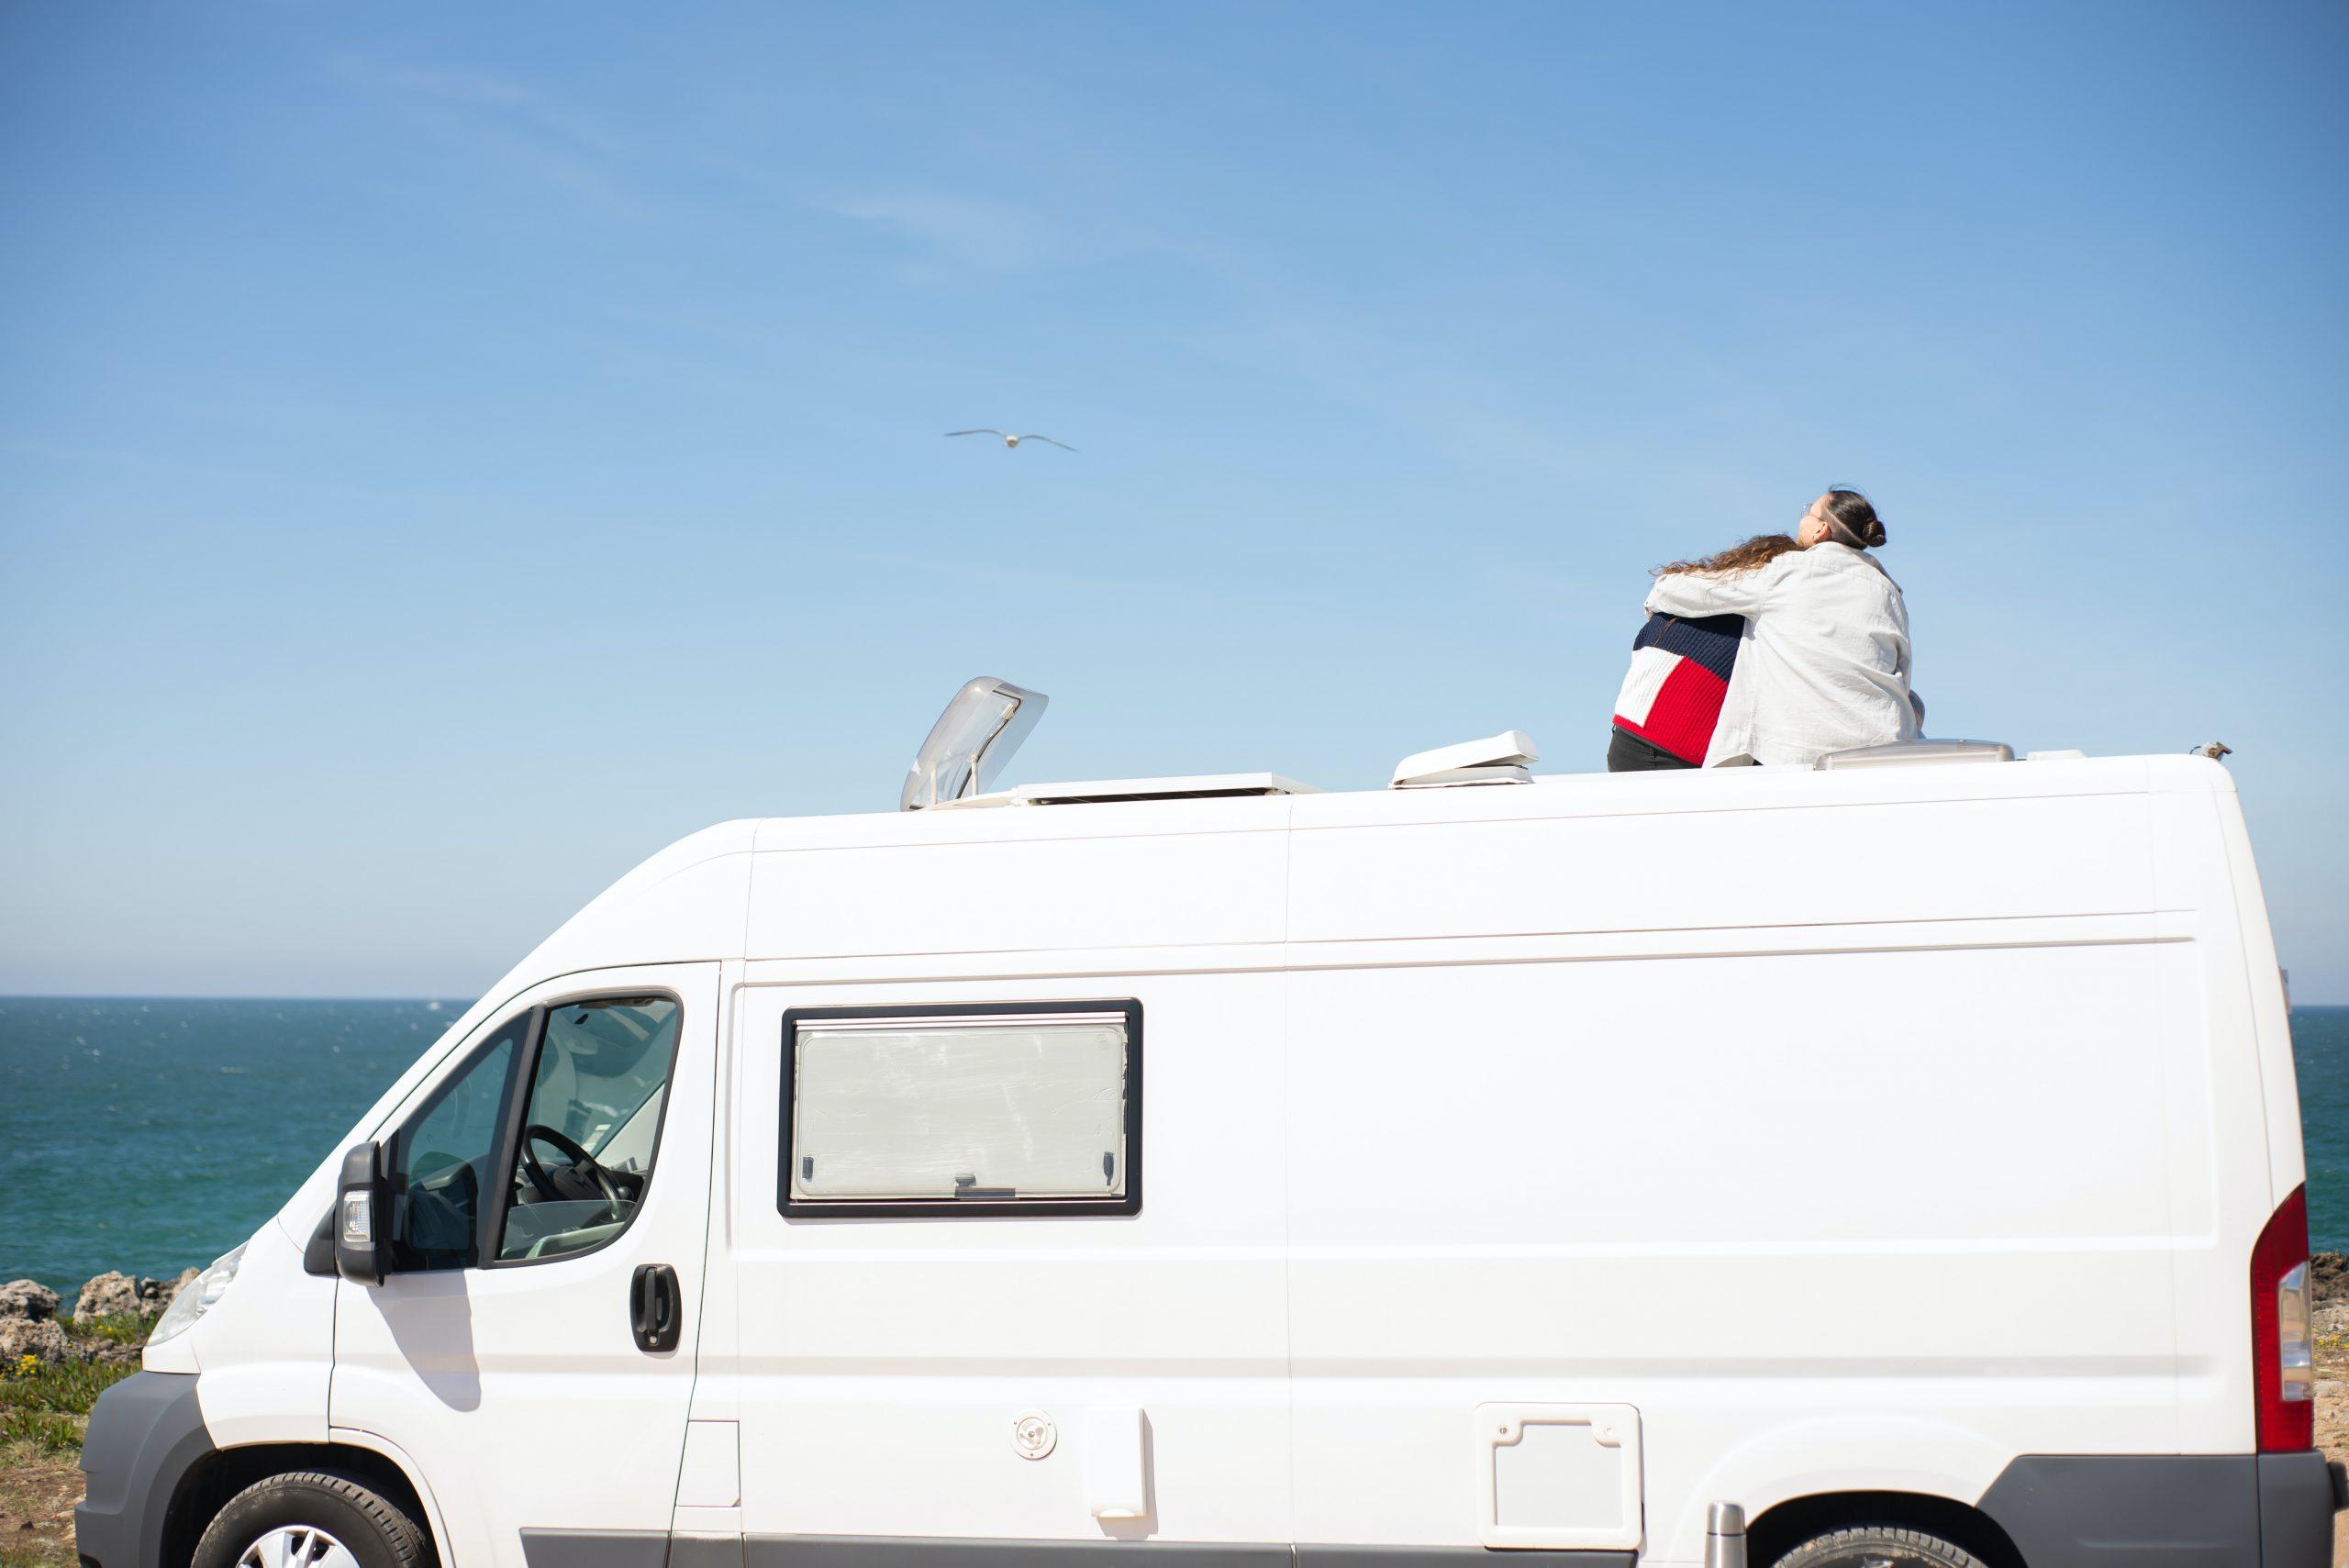 Motorhome Compliance: Getting Caravan Certification